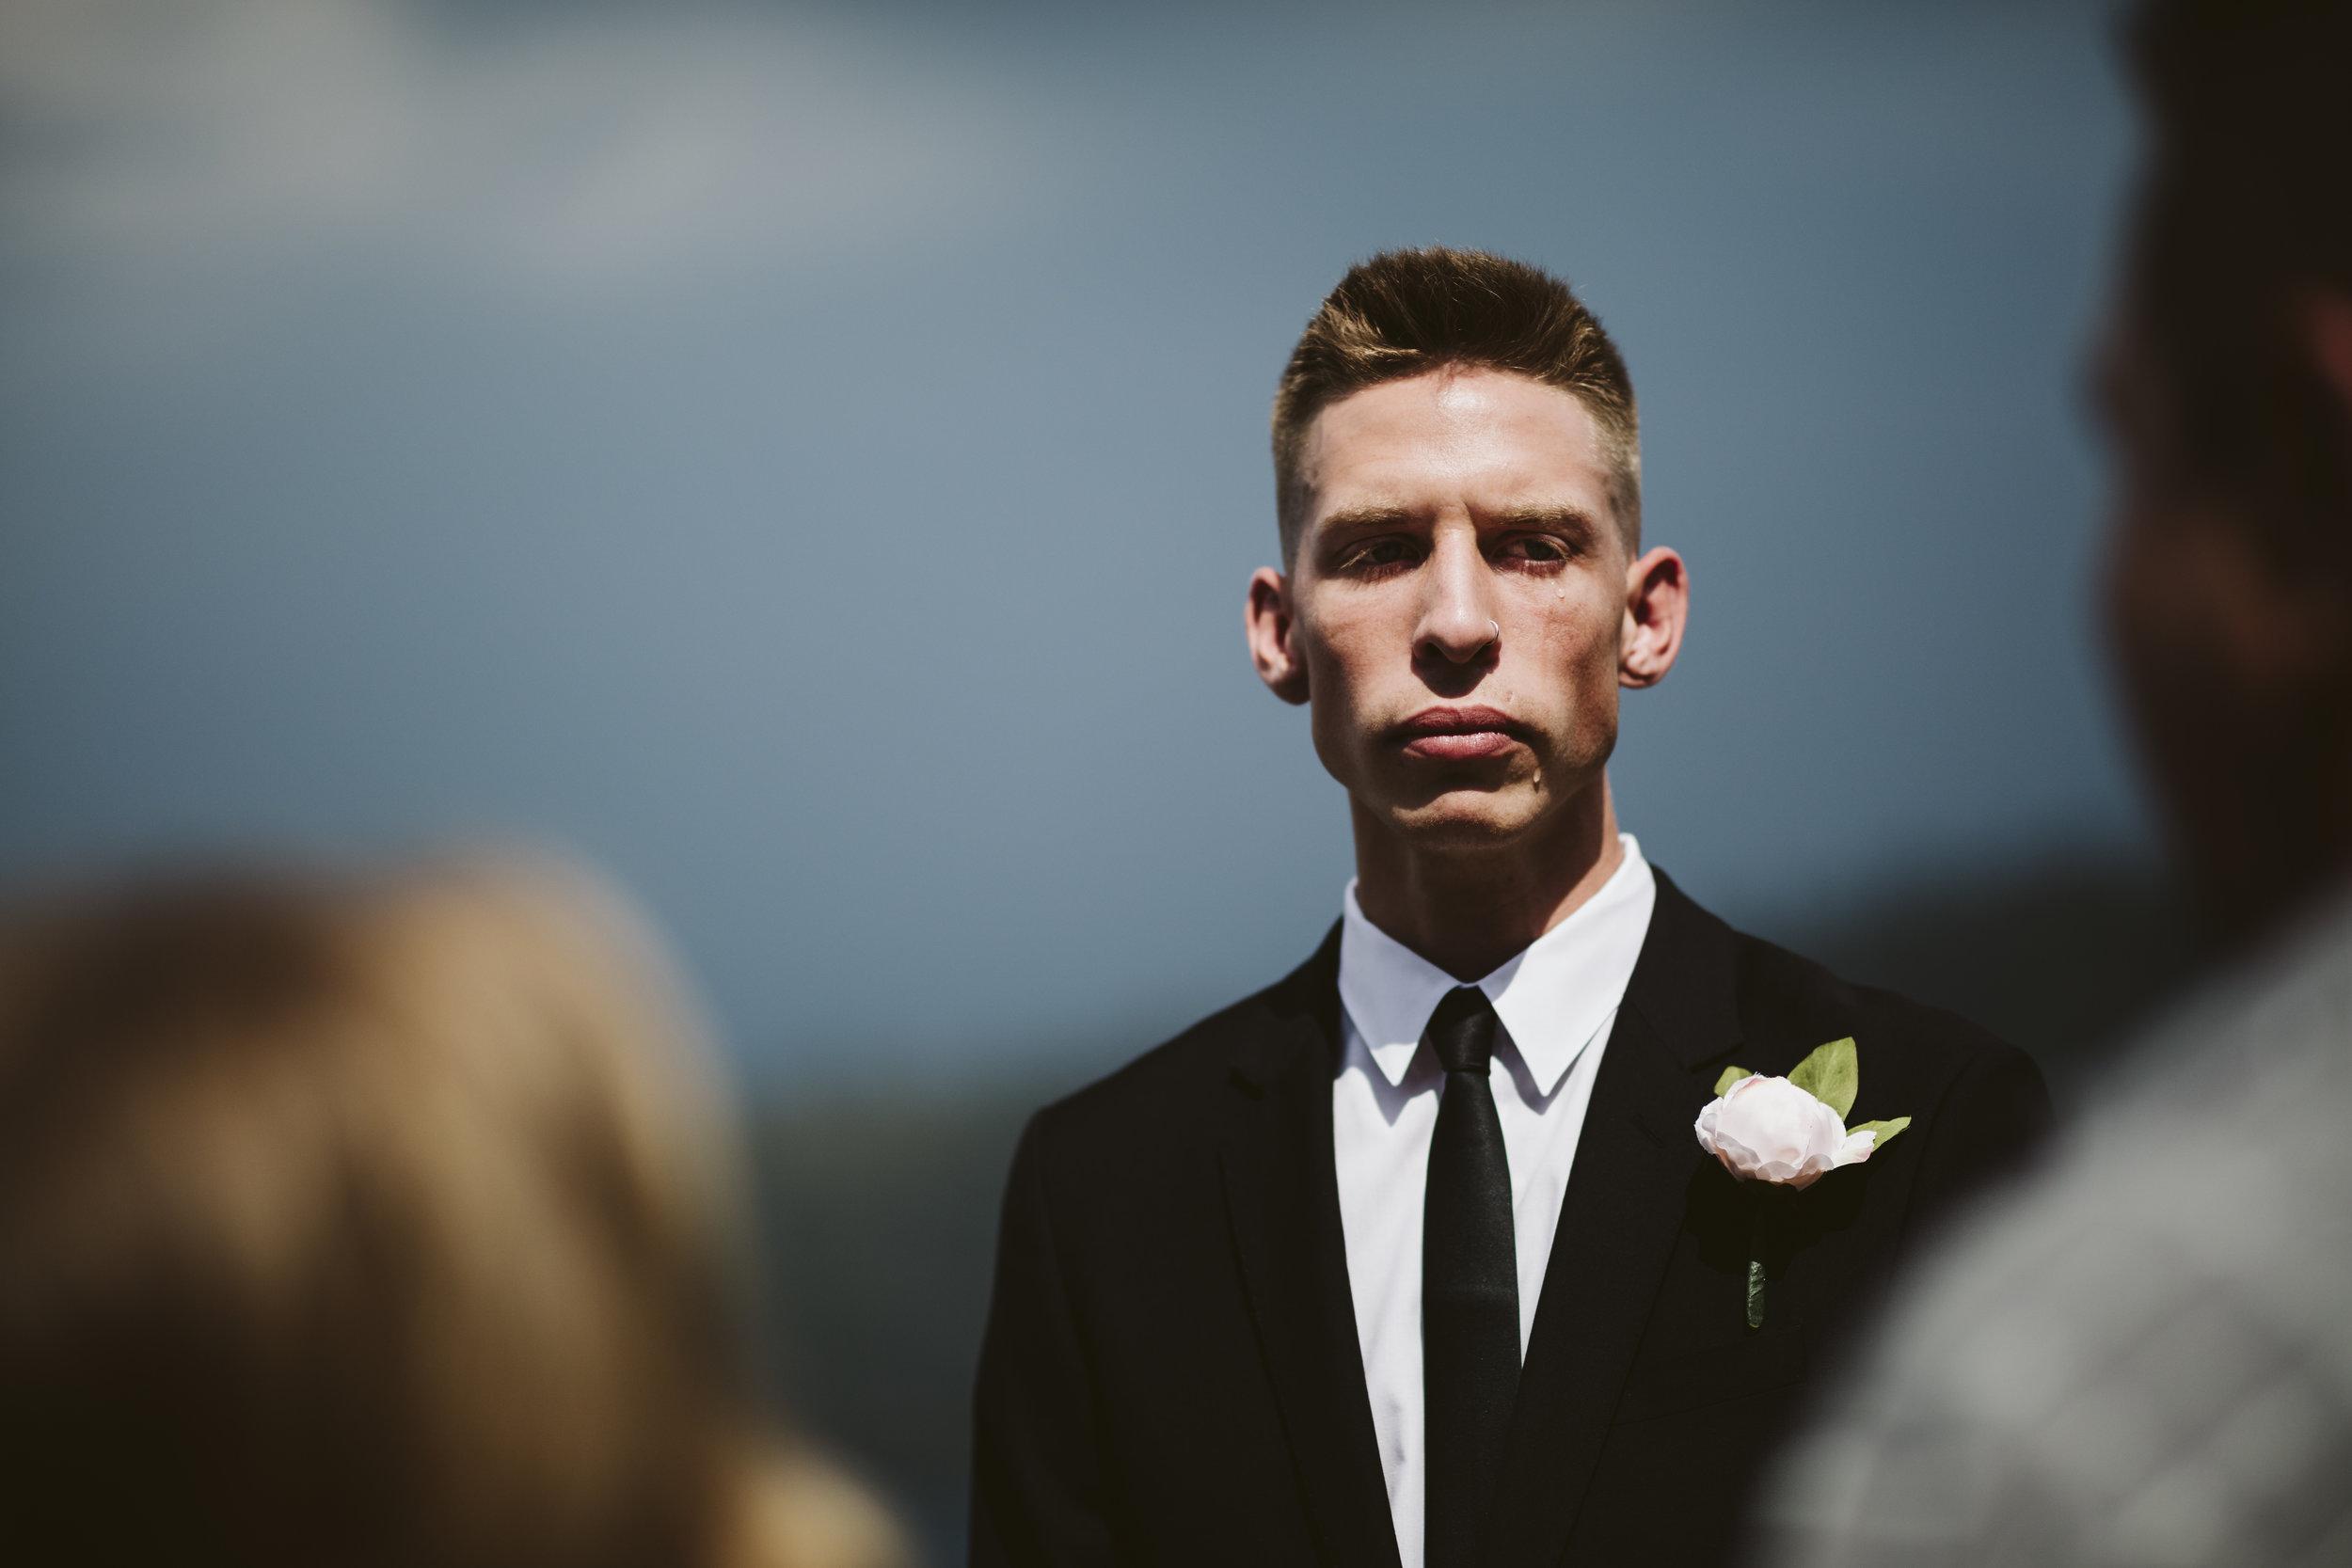 _P8A0218vildphotography-adventurewedding-adventurouswedding-tahoewedding-laketahoewedding-adventureelopement-laketahoeweddingphotographer-wedding-photographer-weddingphotographer-Chase-Sam.jpg